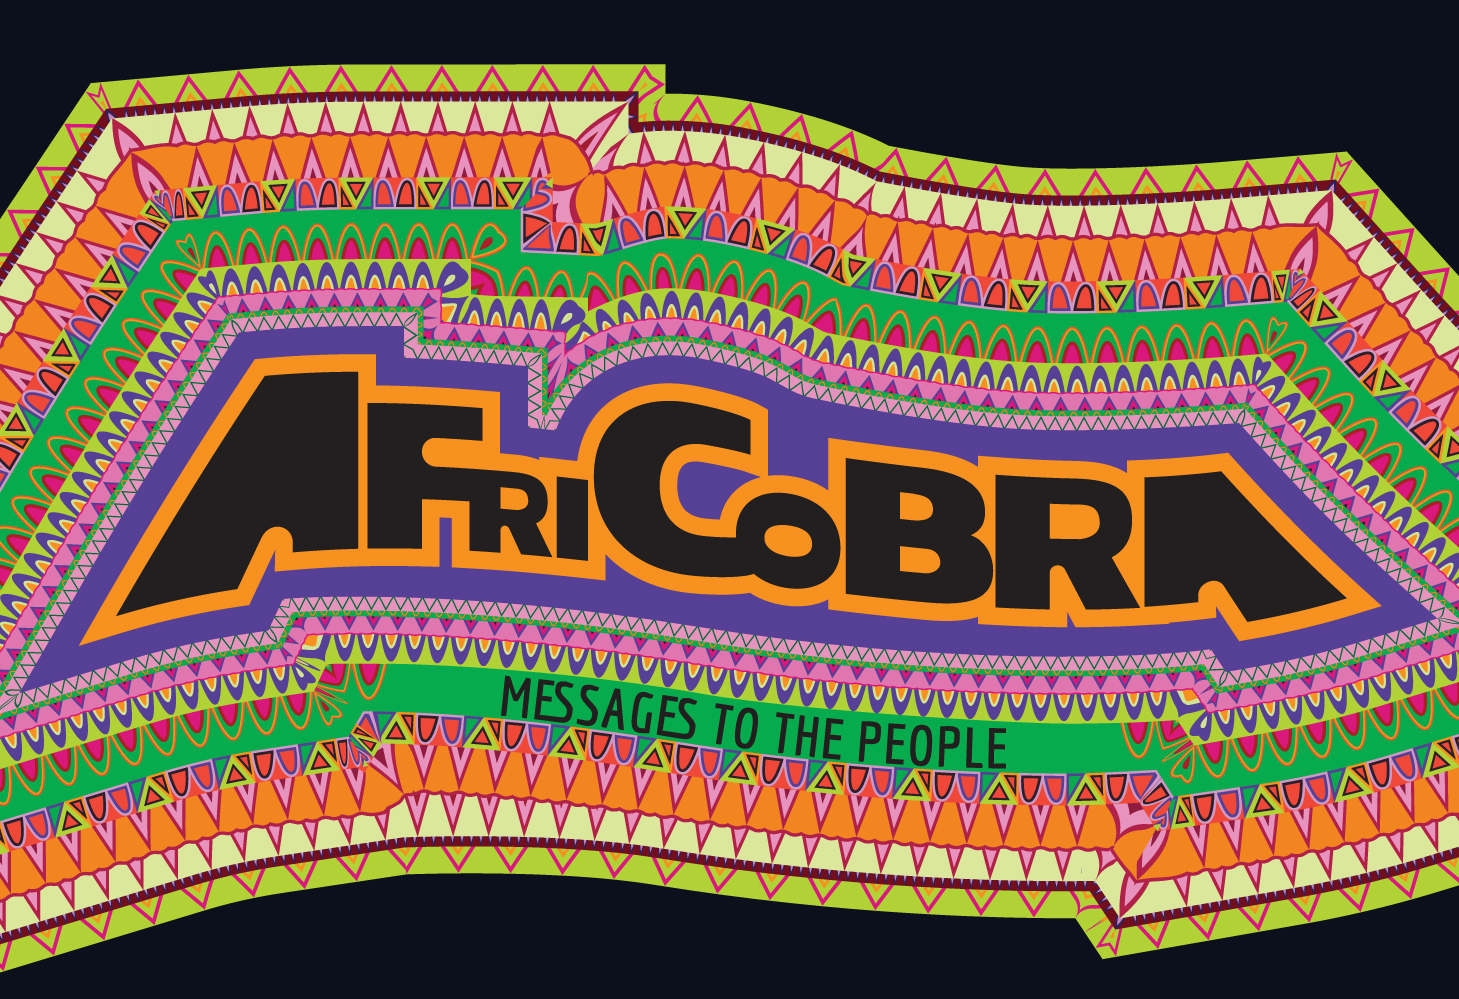 Feature africobra 01